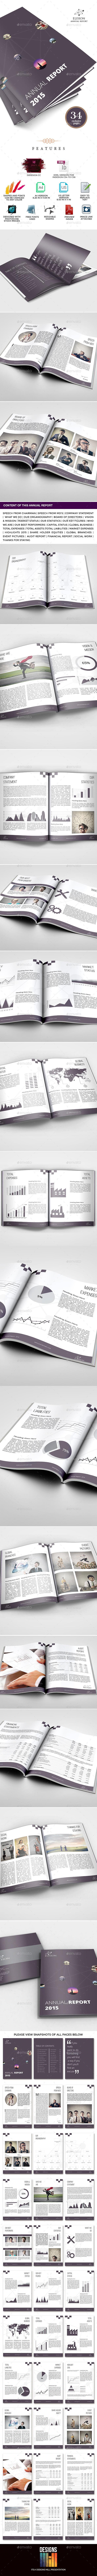 Elision Multipurpose Annual Report Template - Informational Brochures